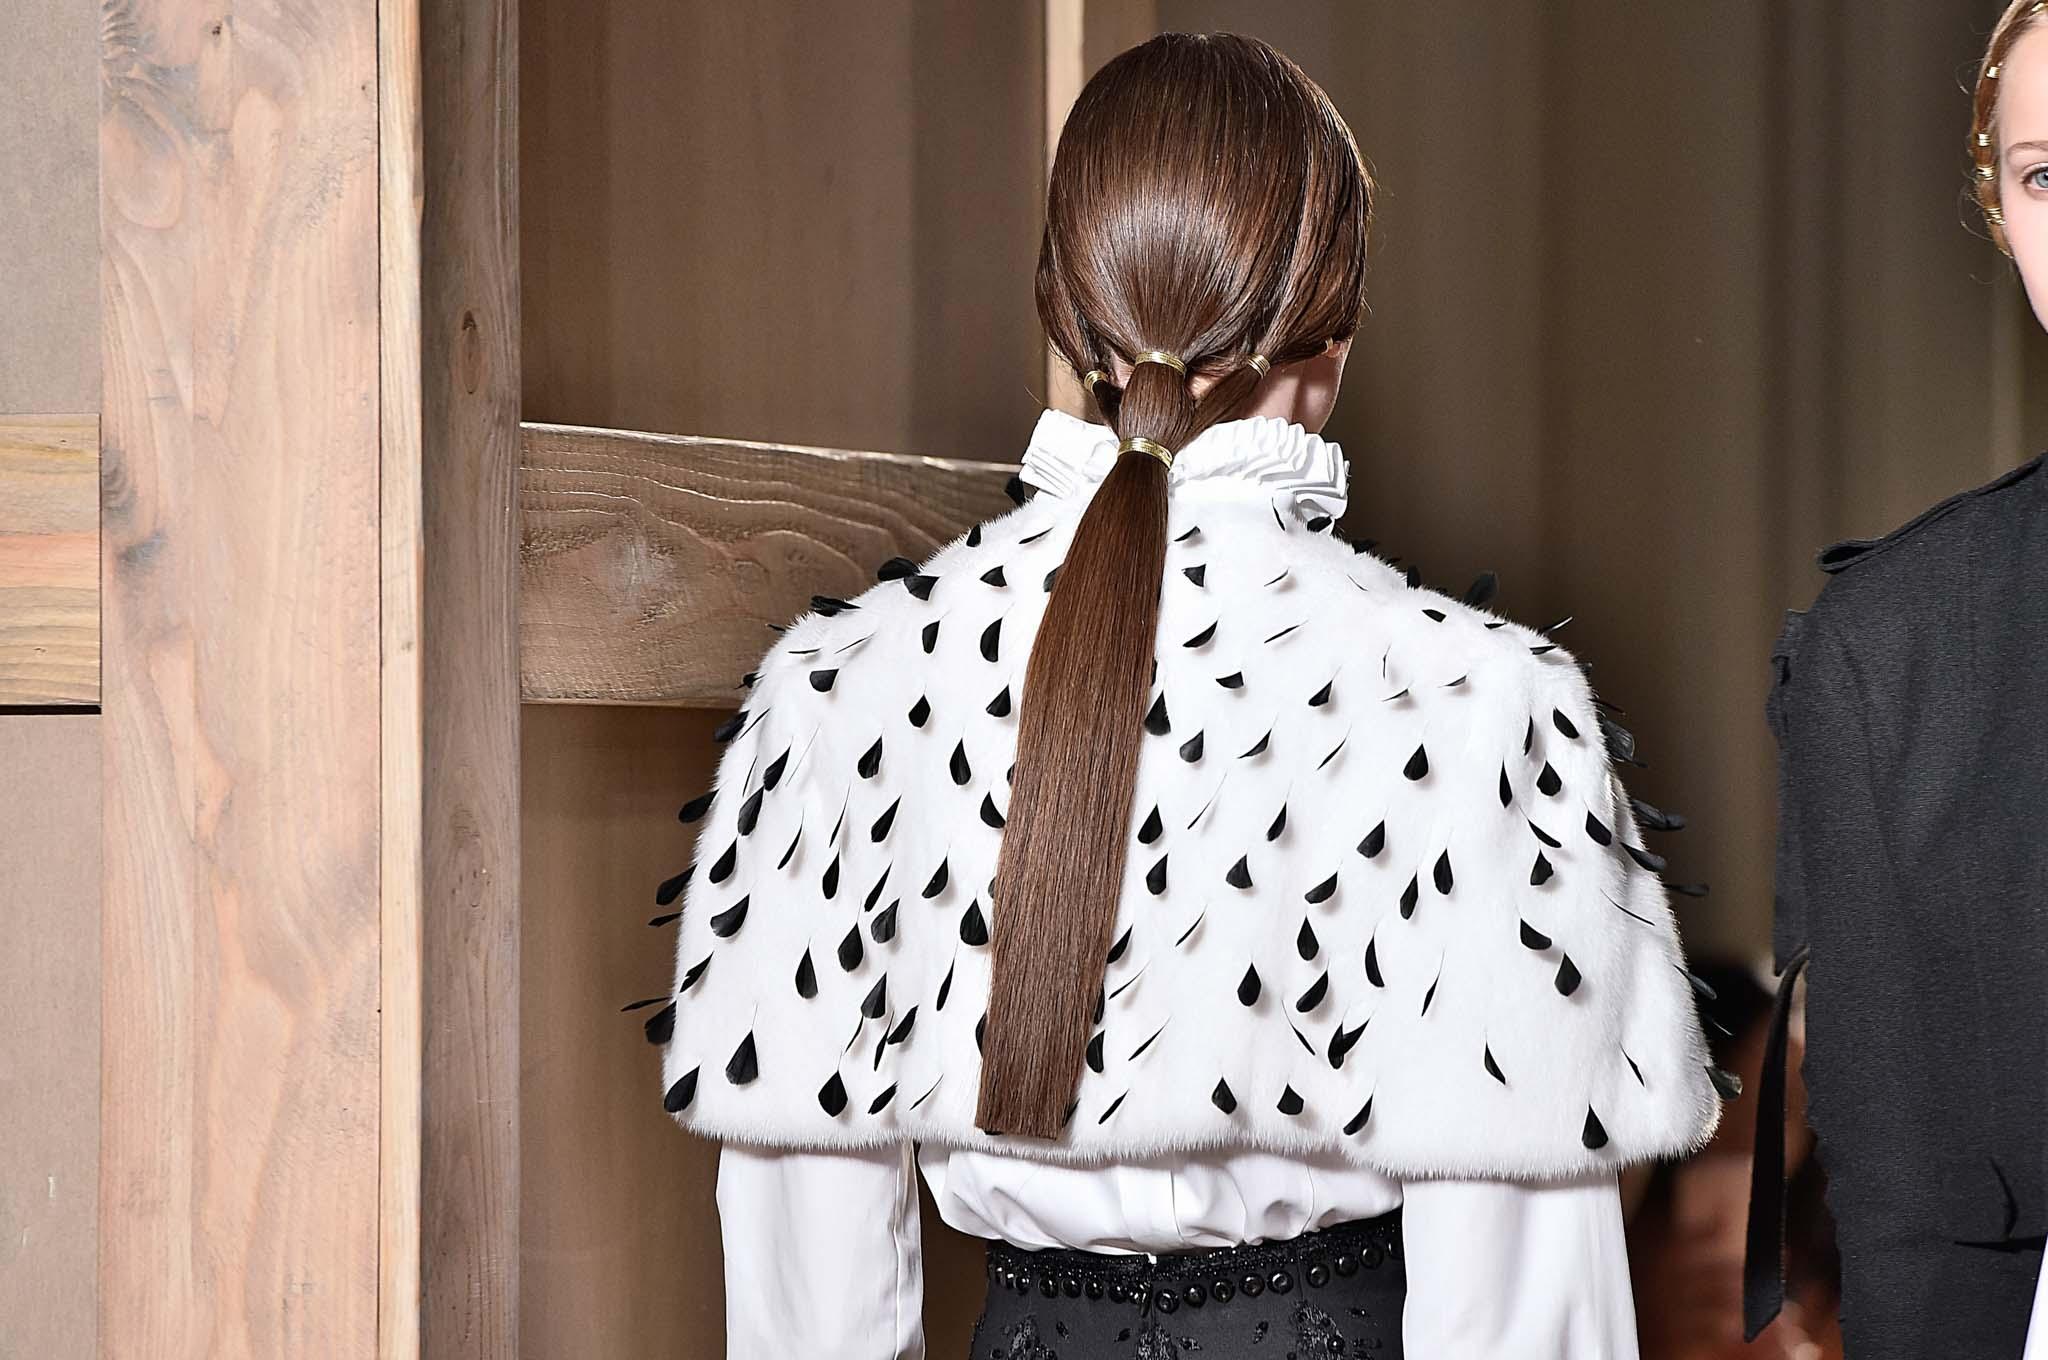 Vista desde atrás de melena castaña atada con una coleta sofisticada (que sale de tres mechones)